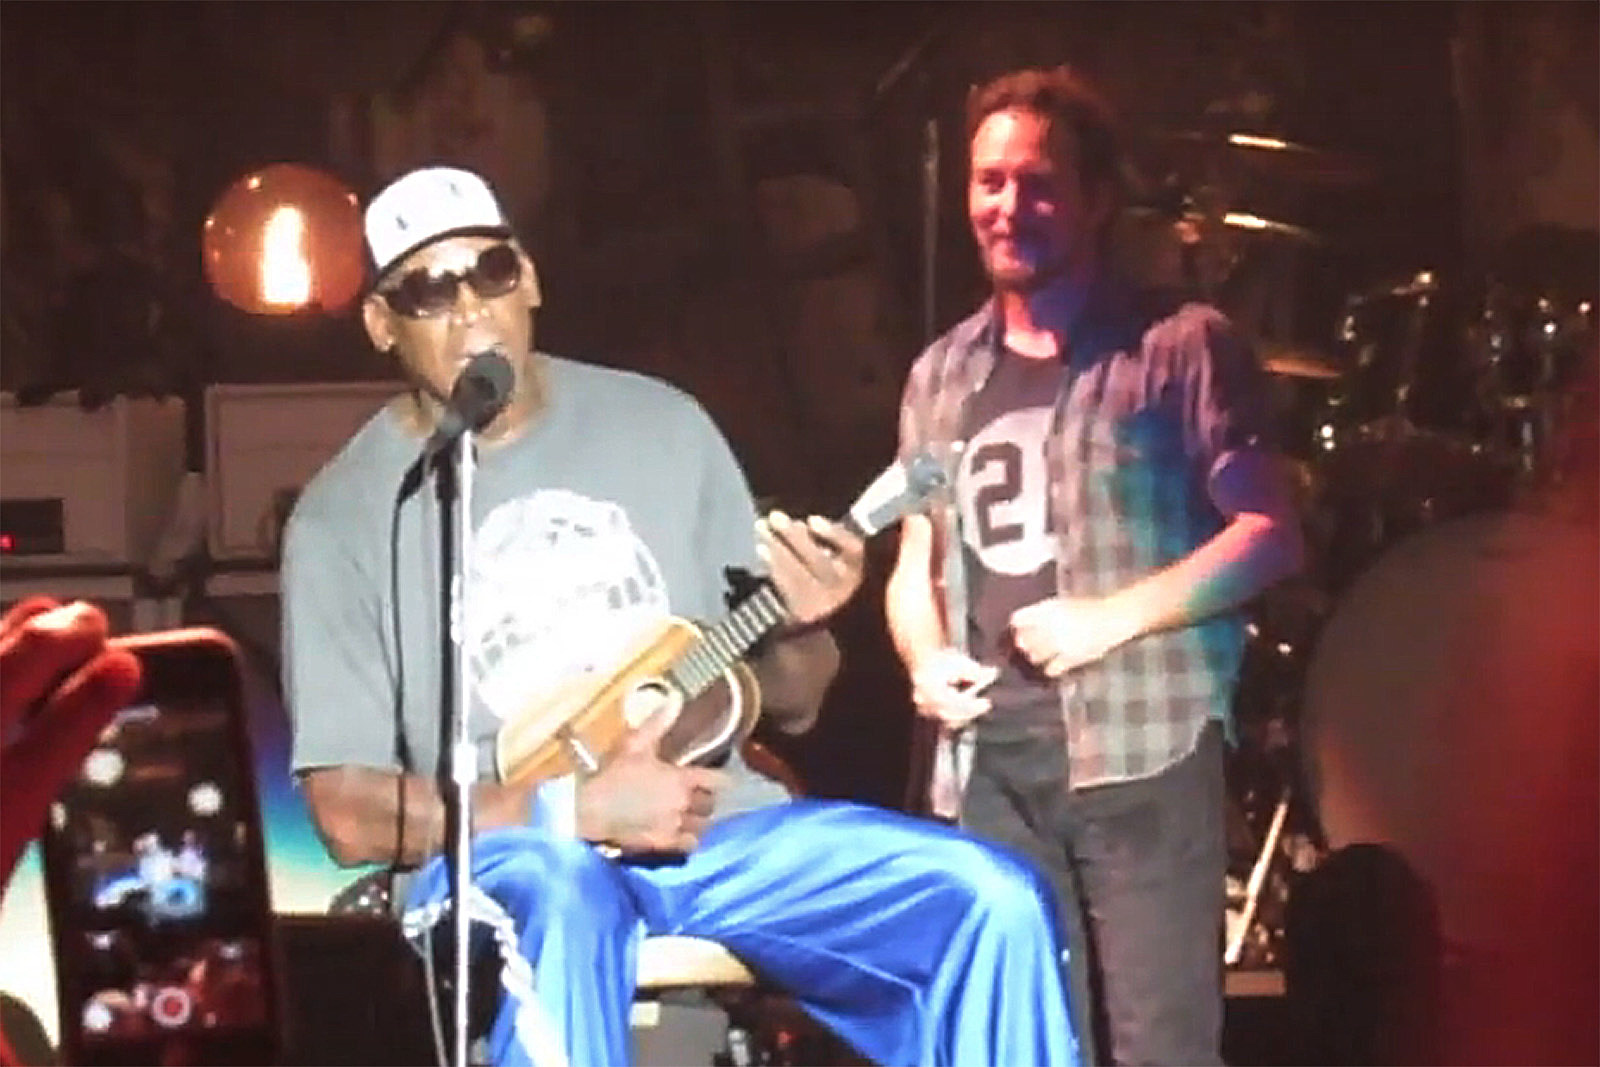 Watch Dennis Rodman Give Eddie Vedder a Ukulele on Pearl Jam Stage